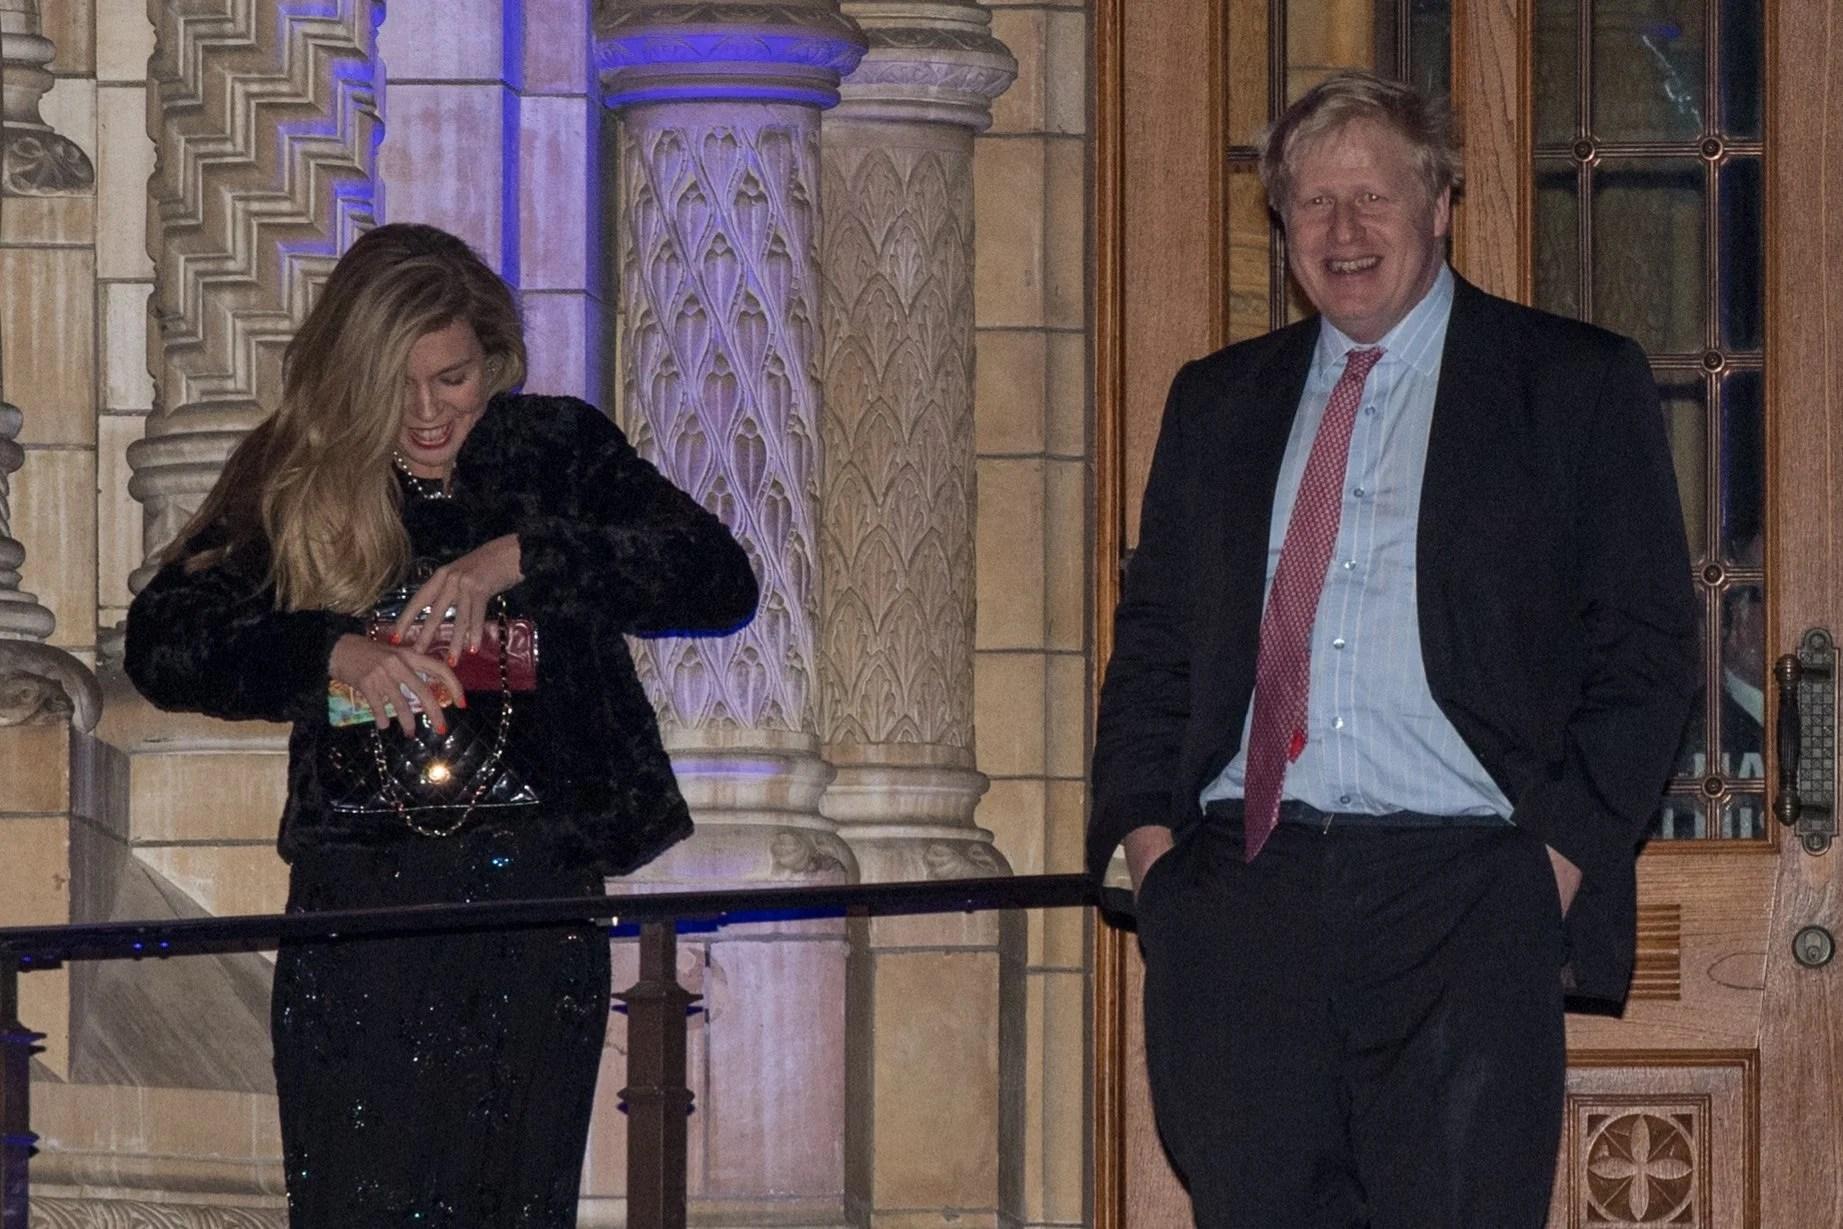 Boris Johnson faces growing backlash over Brexit suicide vest remarks designed to halt Carrie